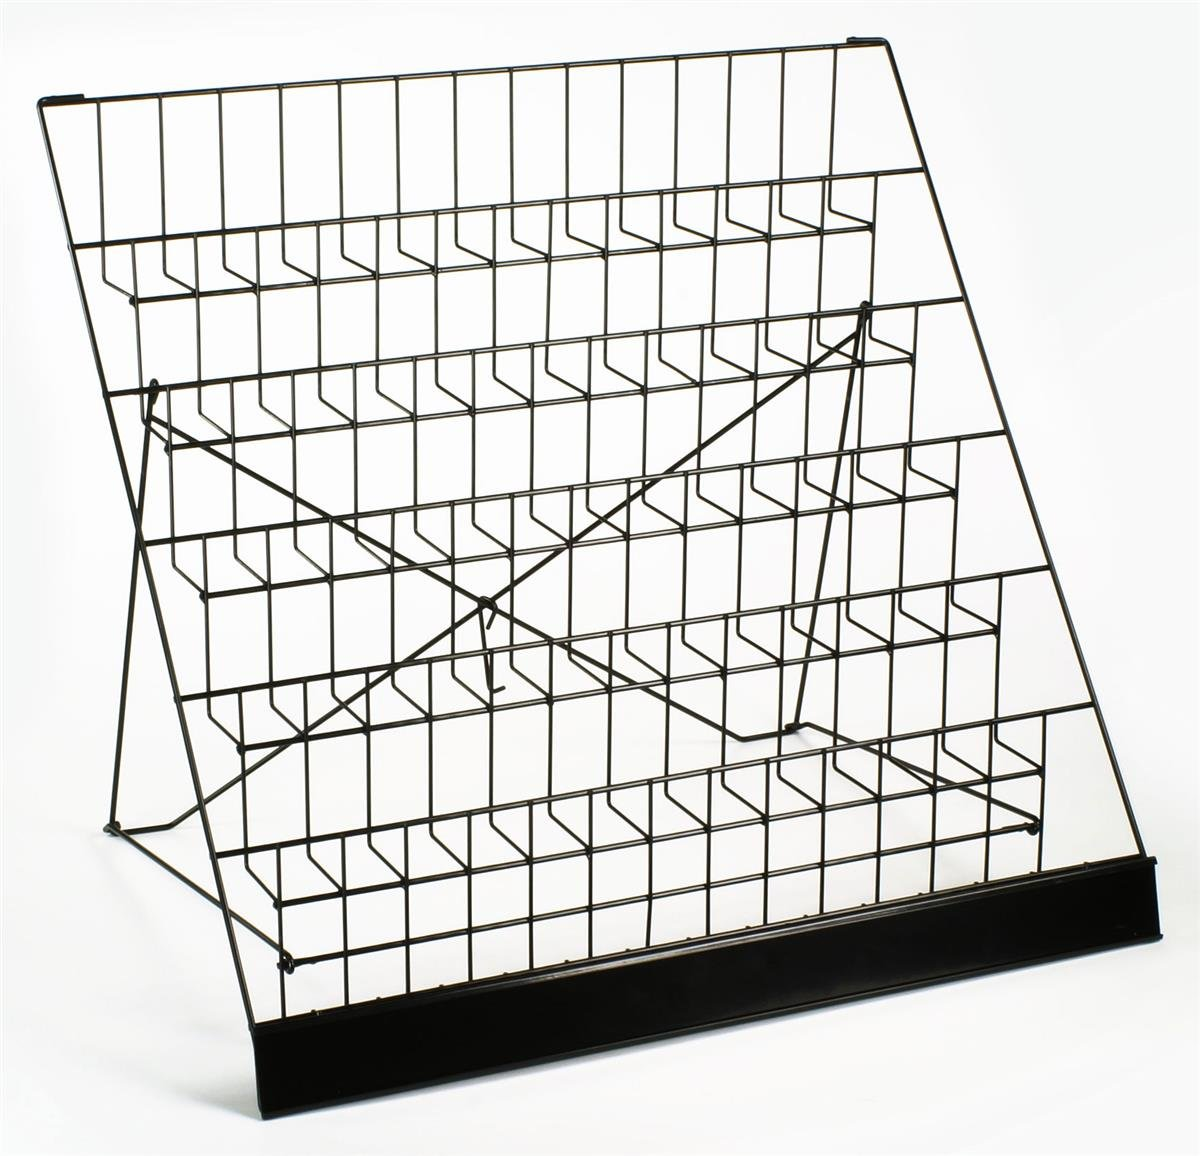 Displays2go Countertop Brochure/Magazine Rack, 6-Tier Organizer, Black Steel (WRC6T2915) by Displays2go (Image #2)